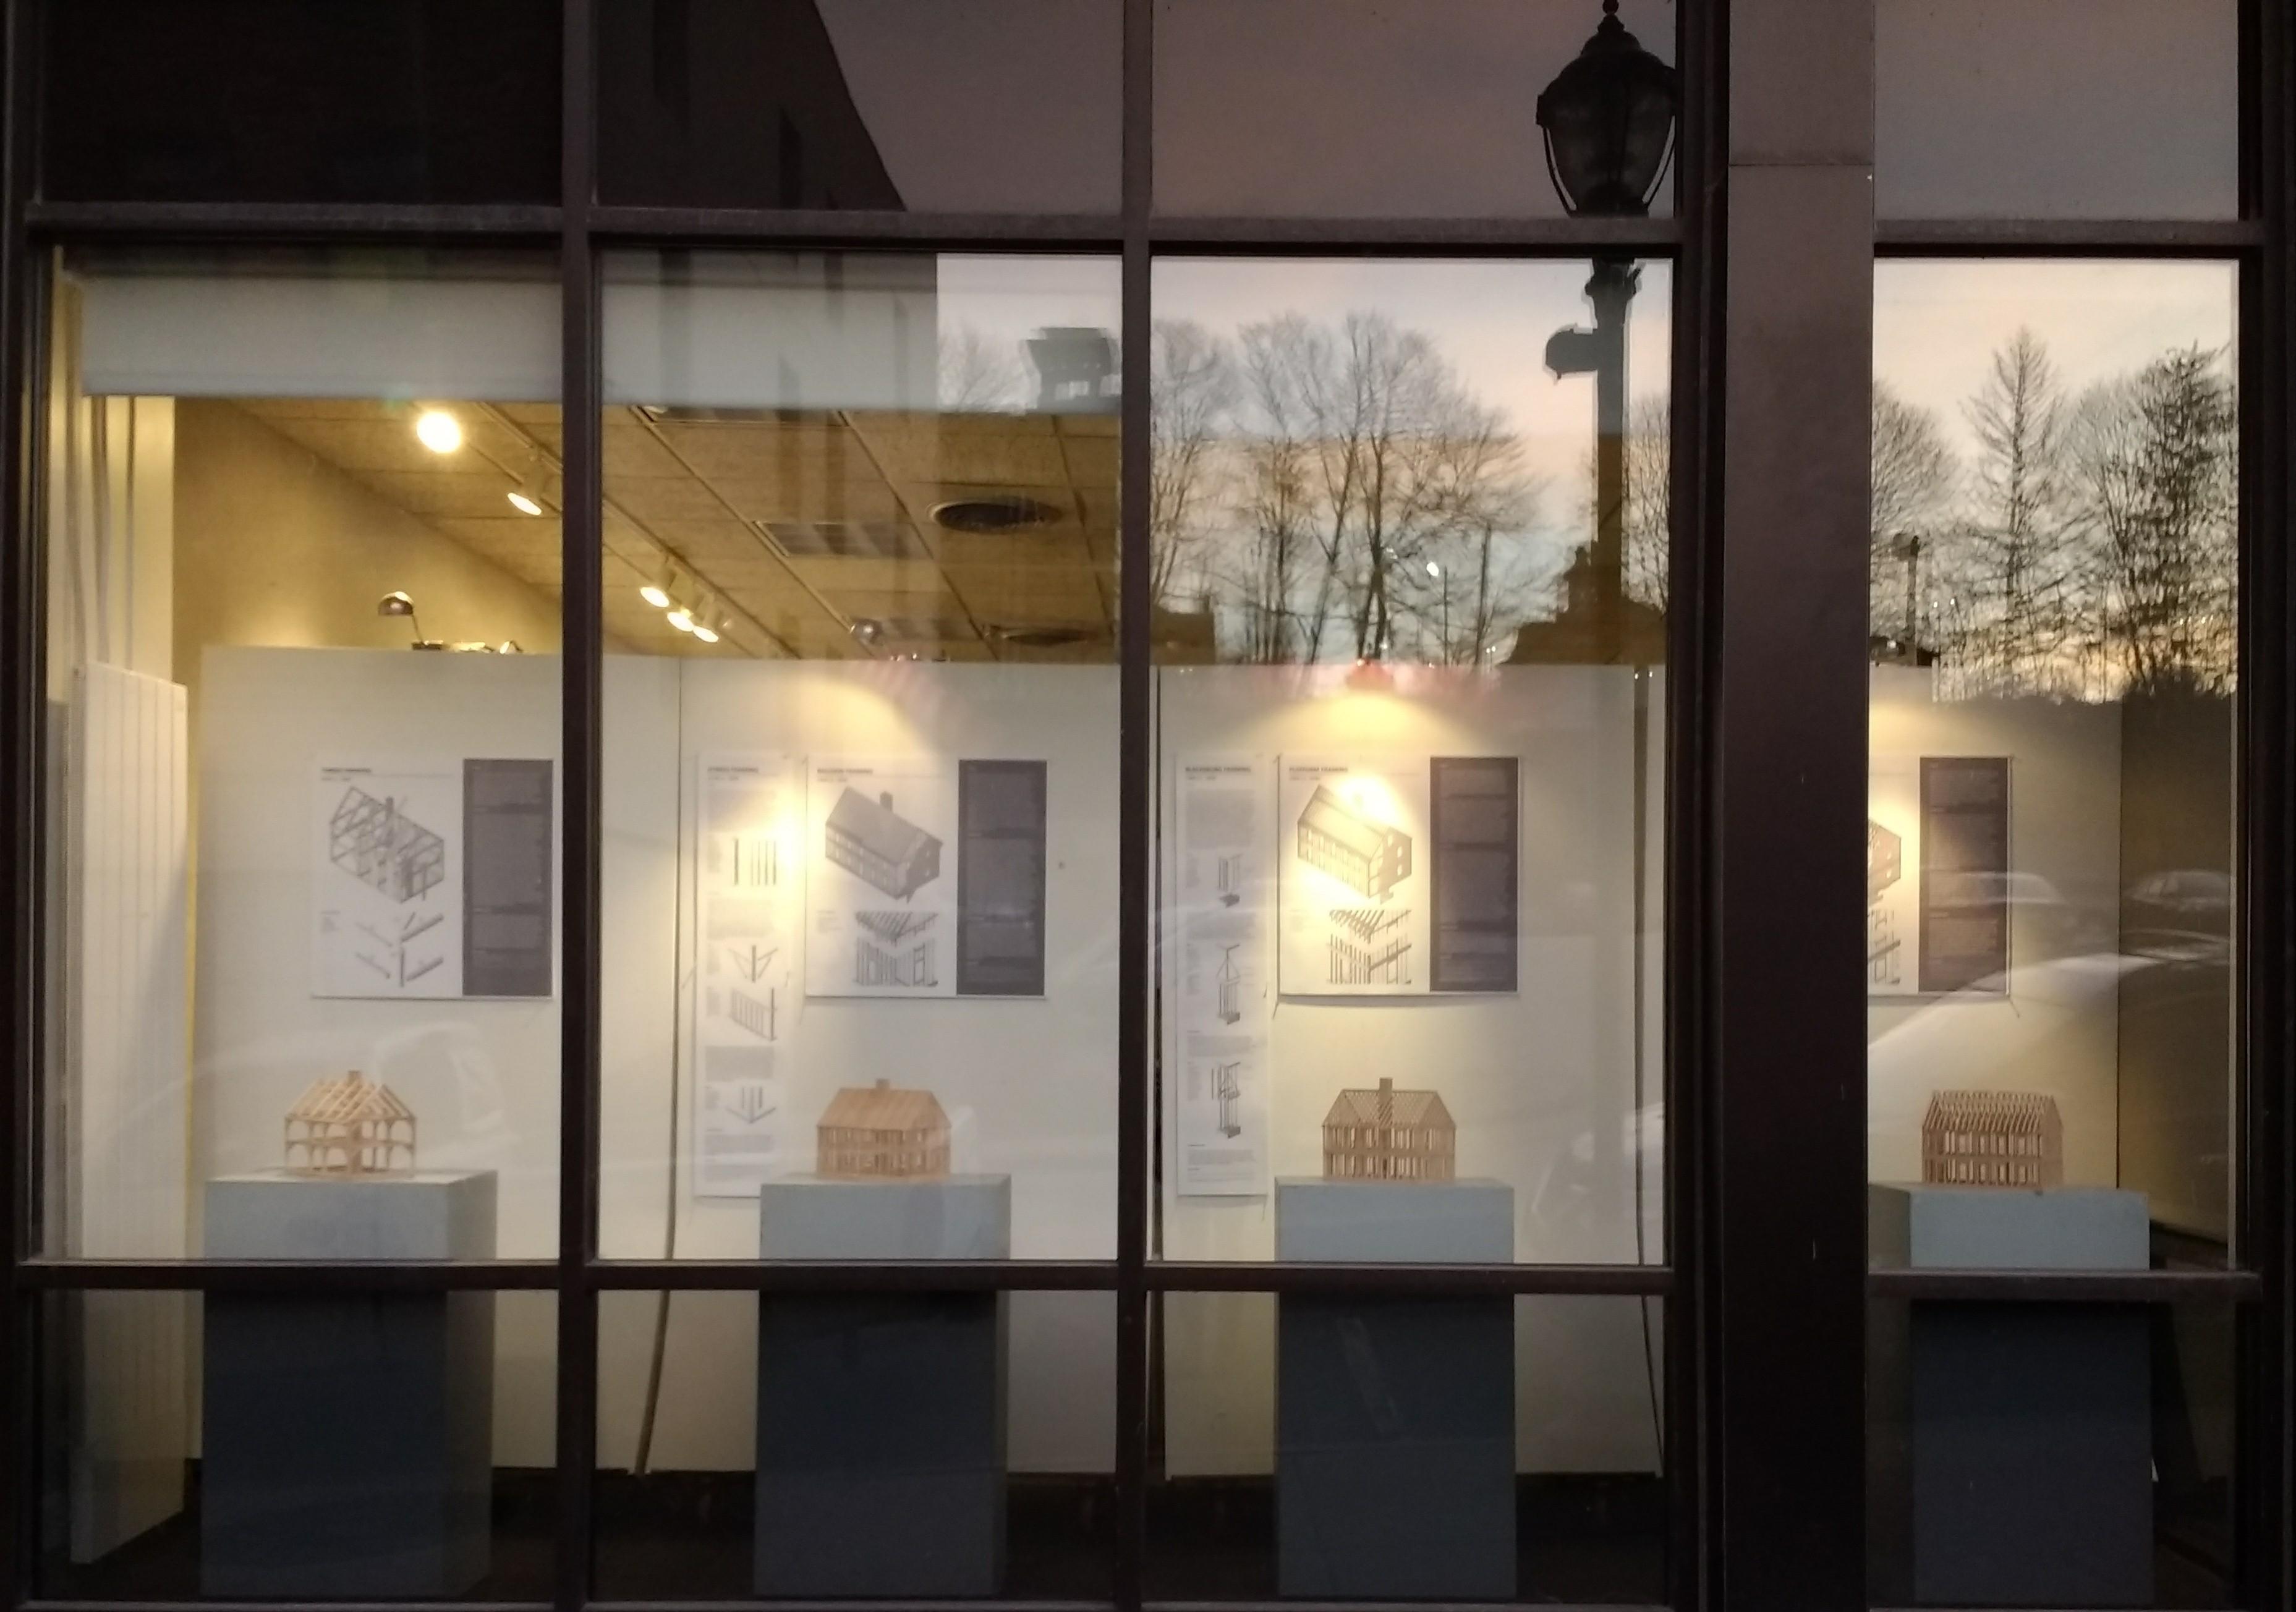 Gallery Exhibit Display